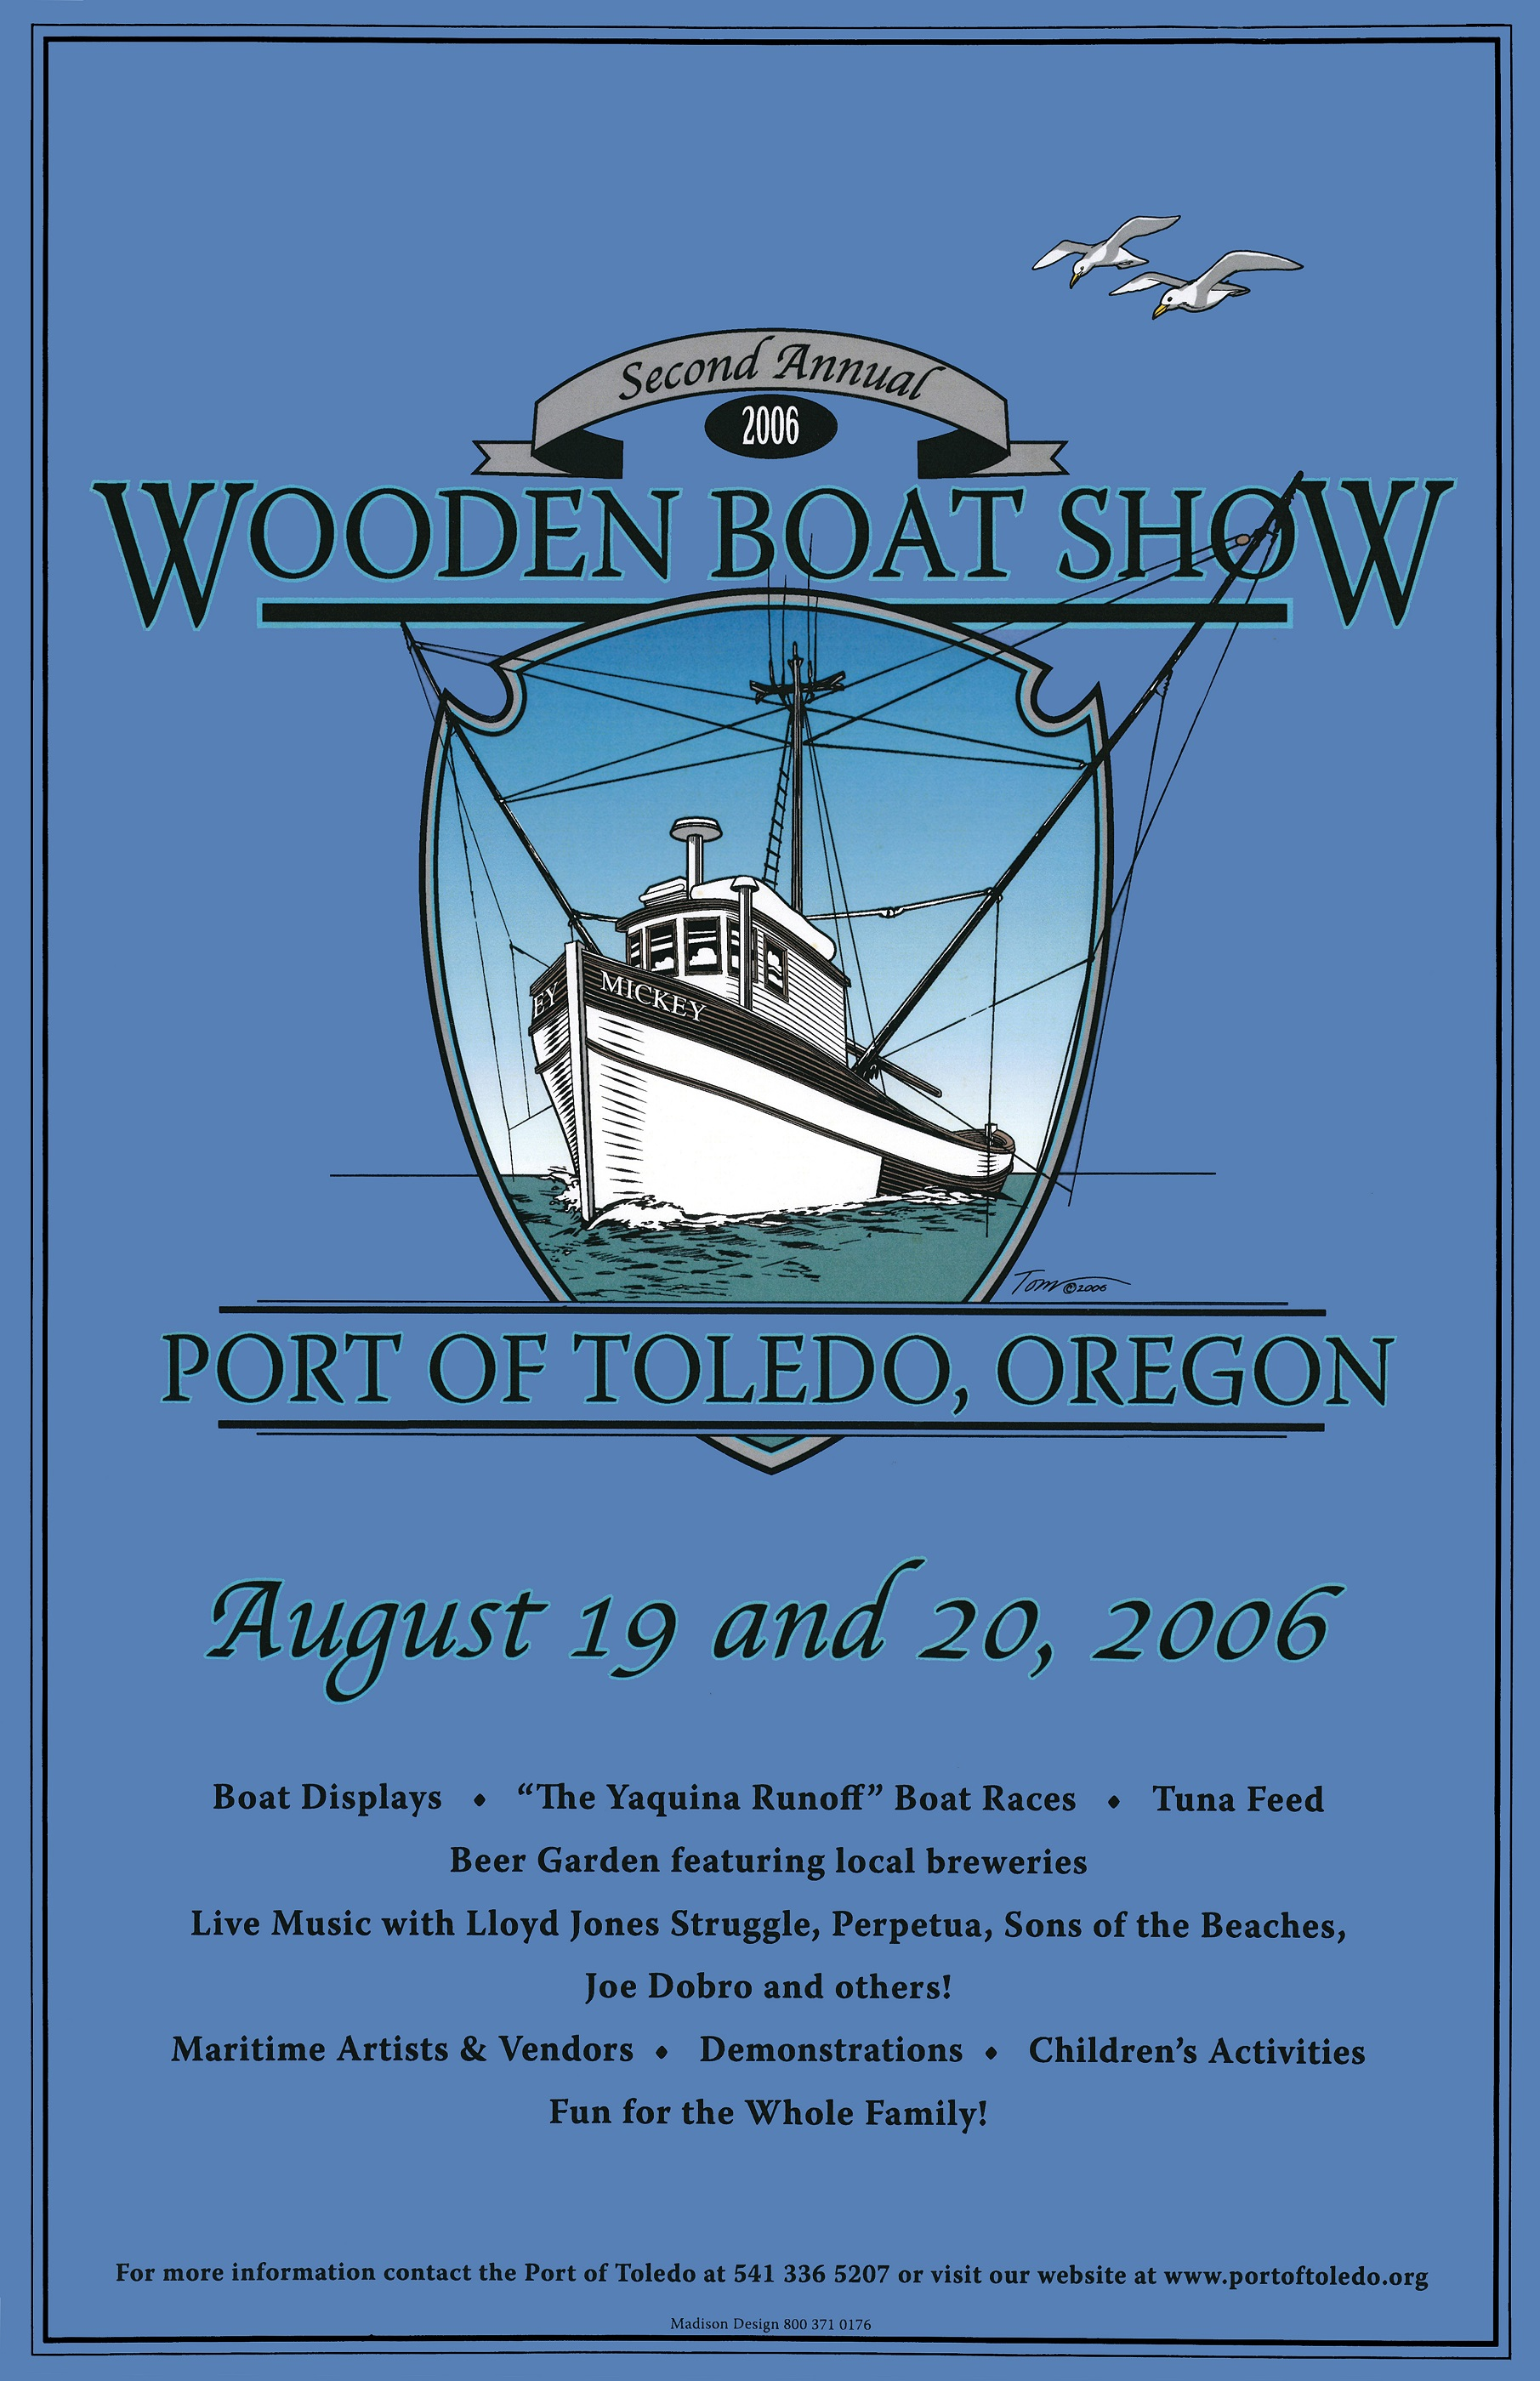 Wbs Posters Port Of Toledo Toledo Oregon Marina Marine Services